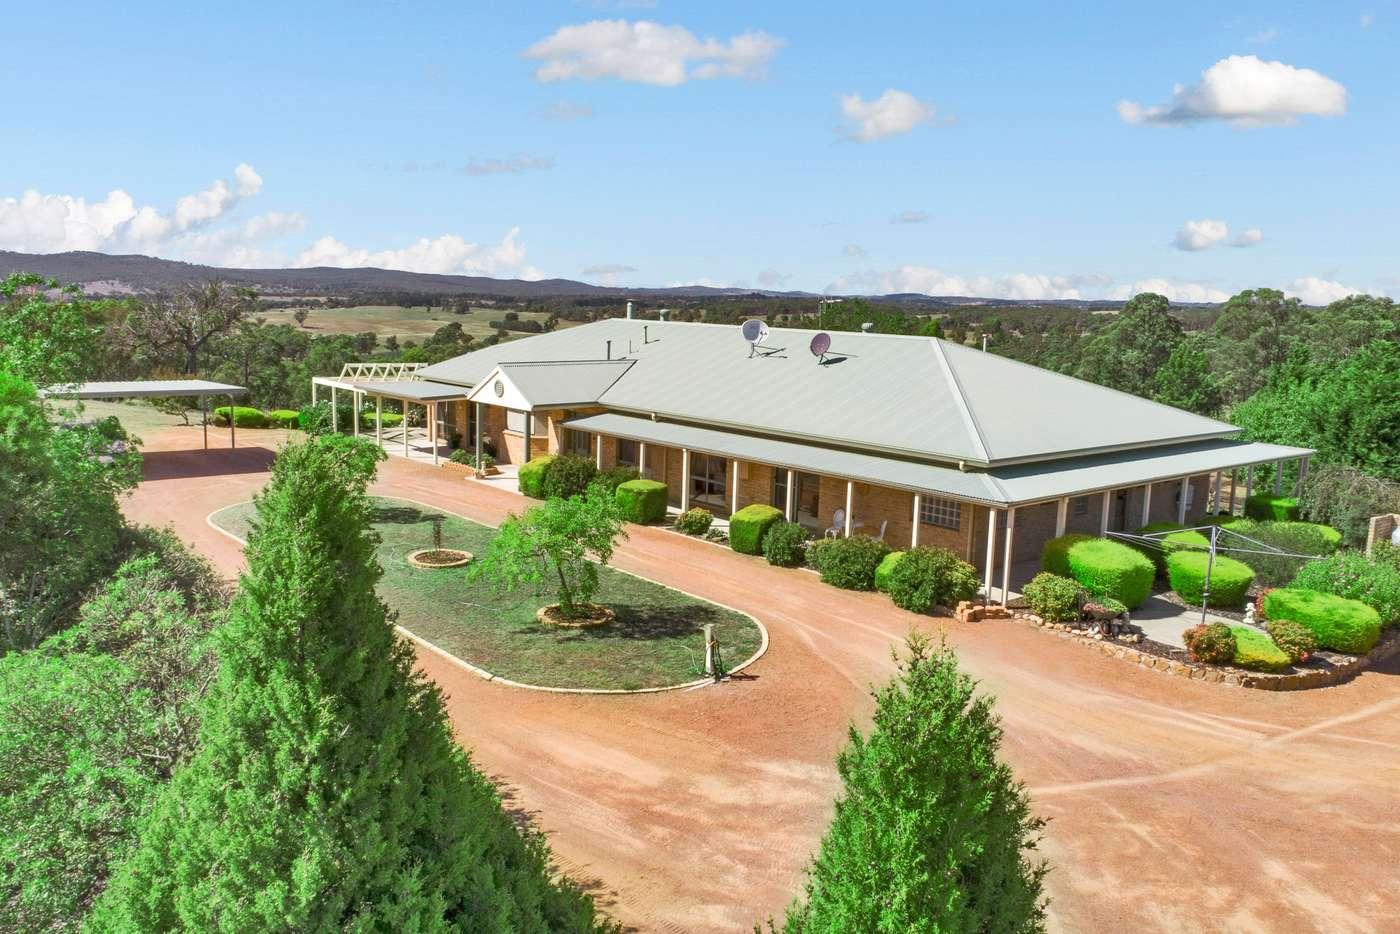 Main view of Homely house listing, 278 Shingle Hill Way, Gundaroo NSW 2620